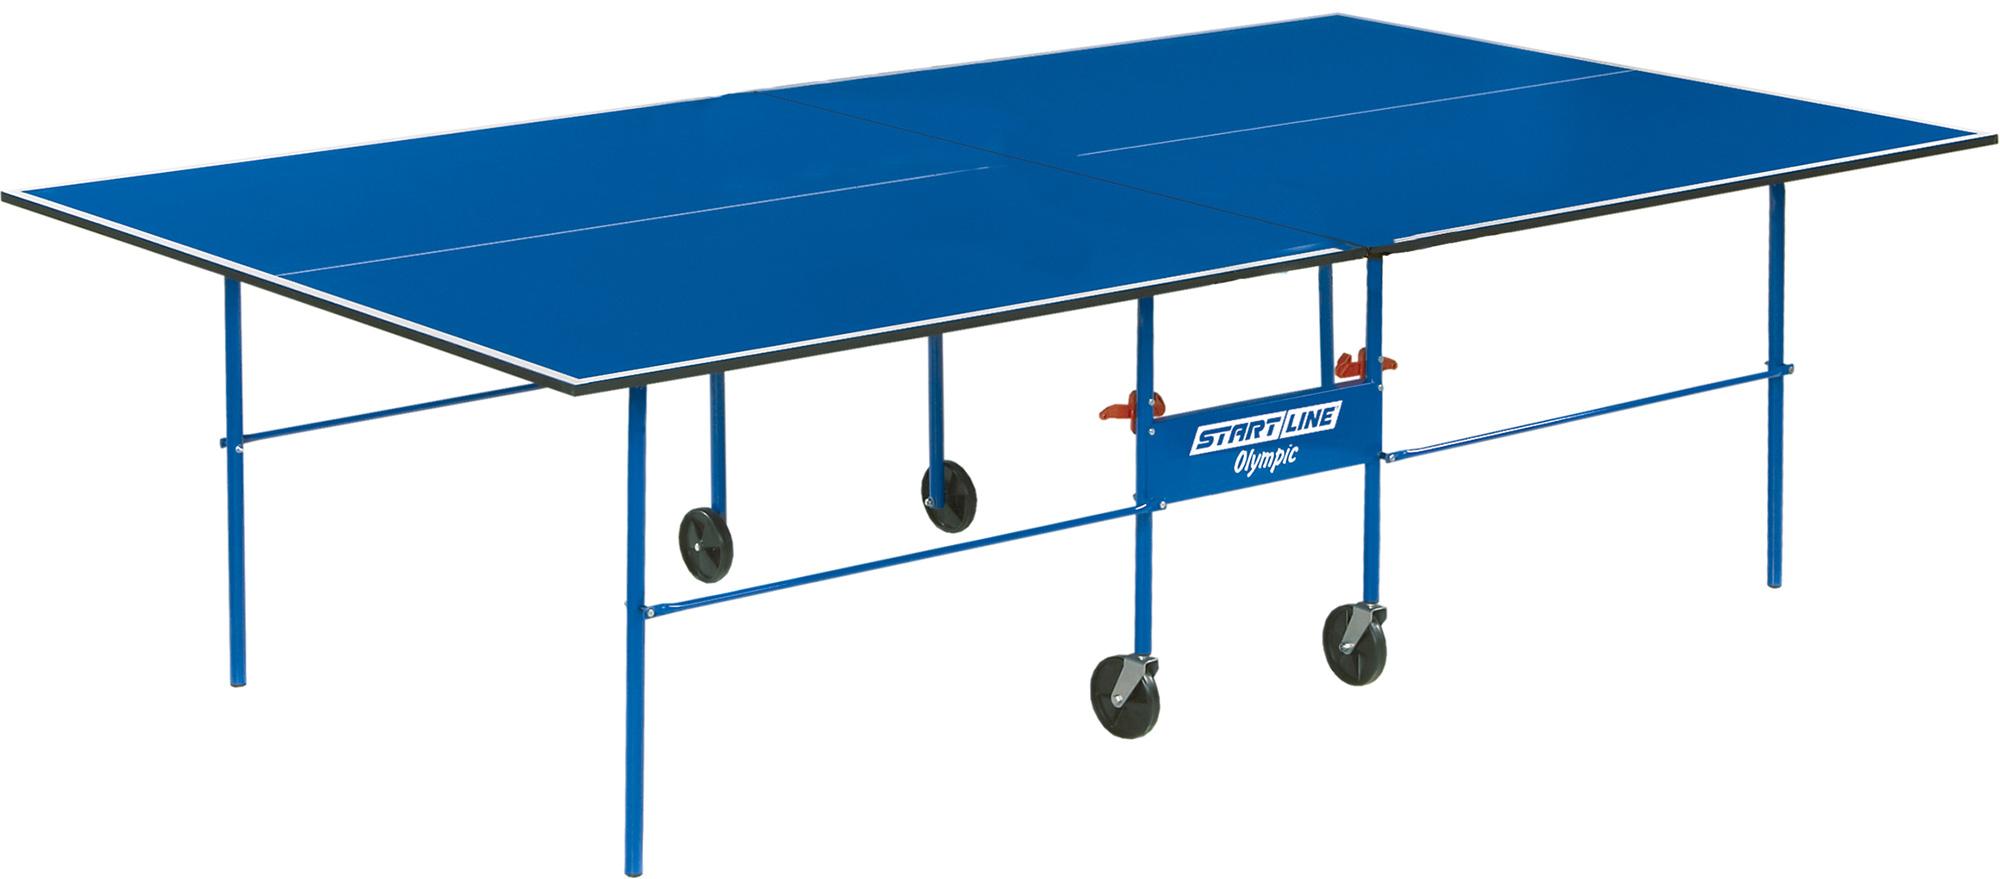 Start line Теннисный стол для помещений START LINE Olympic start line